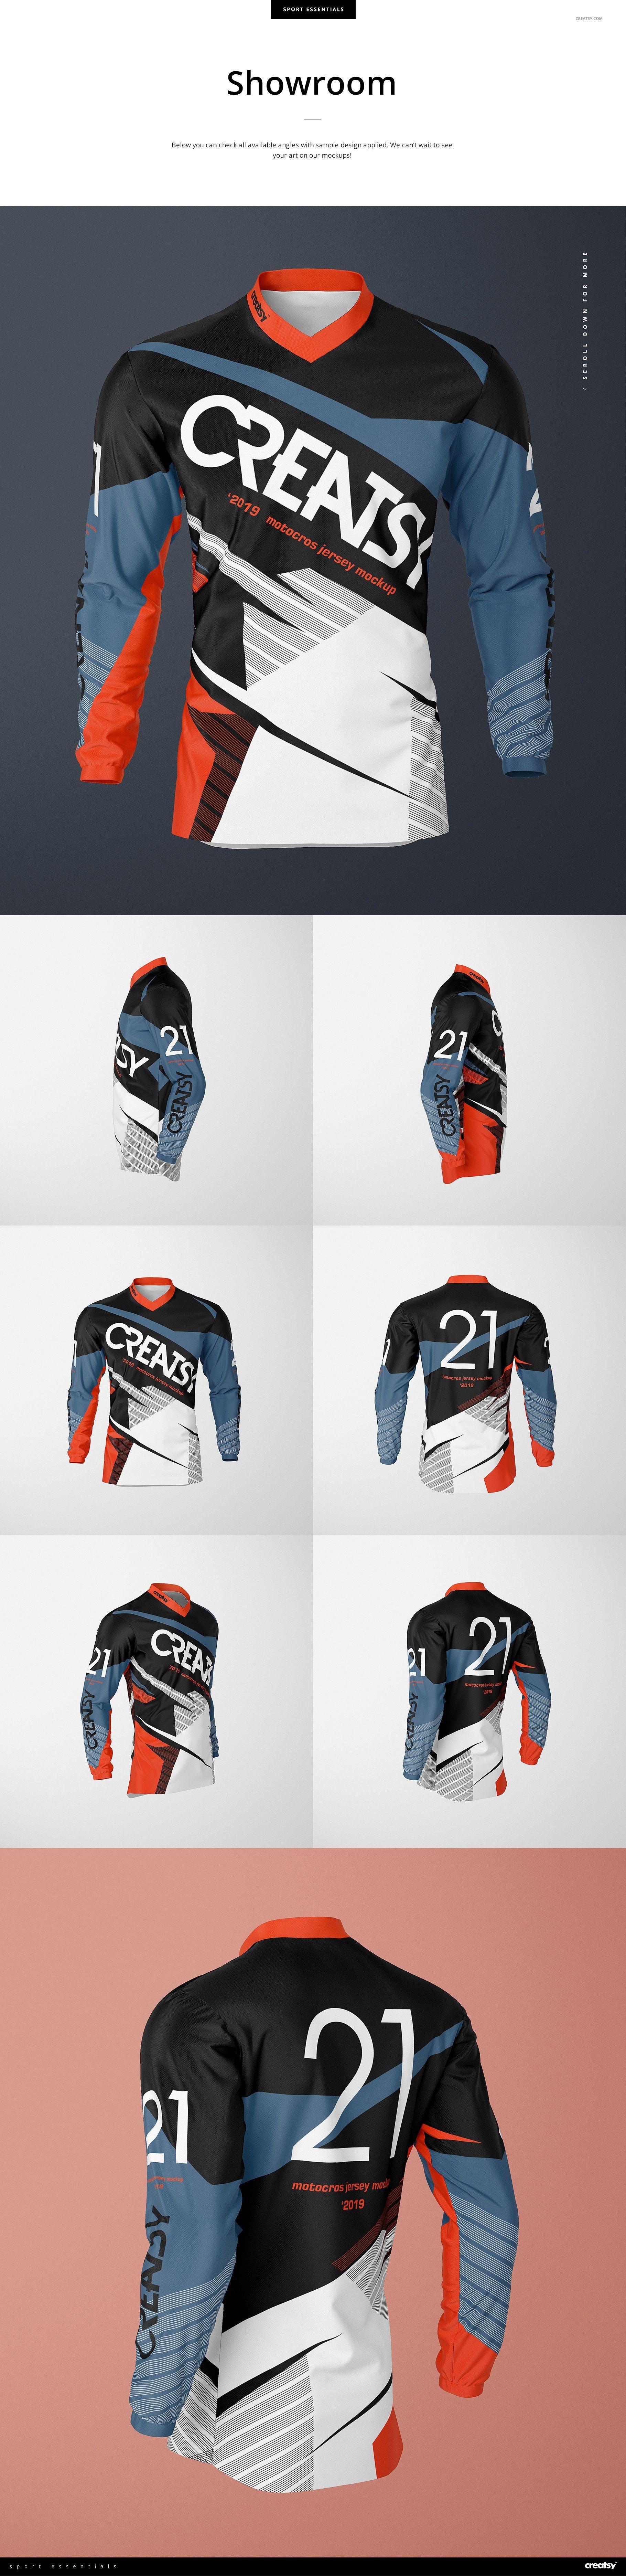 Download Motocross Jersey Mockup Set | Motocross, Jersey, Business ...